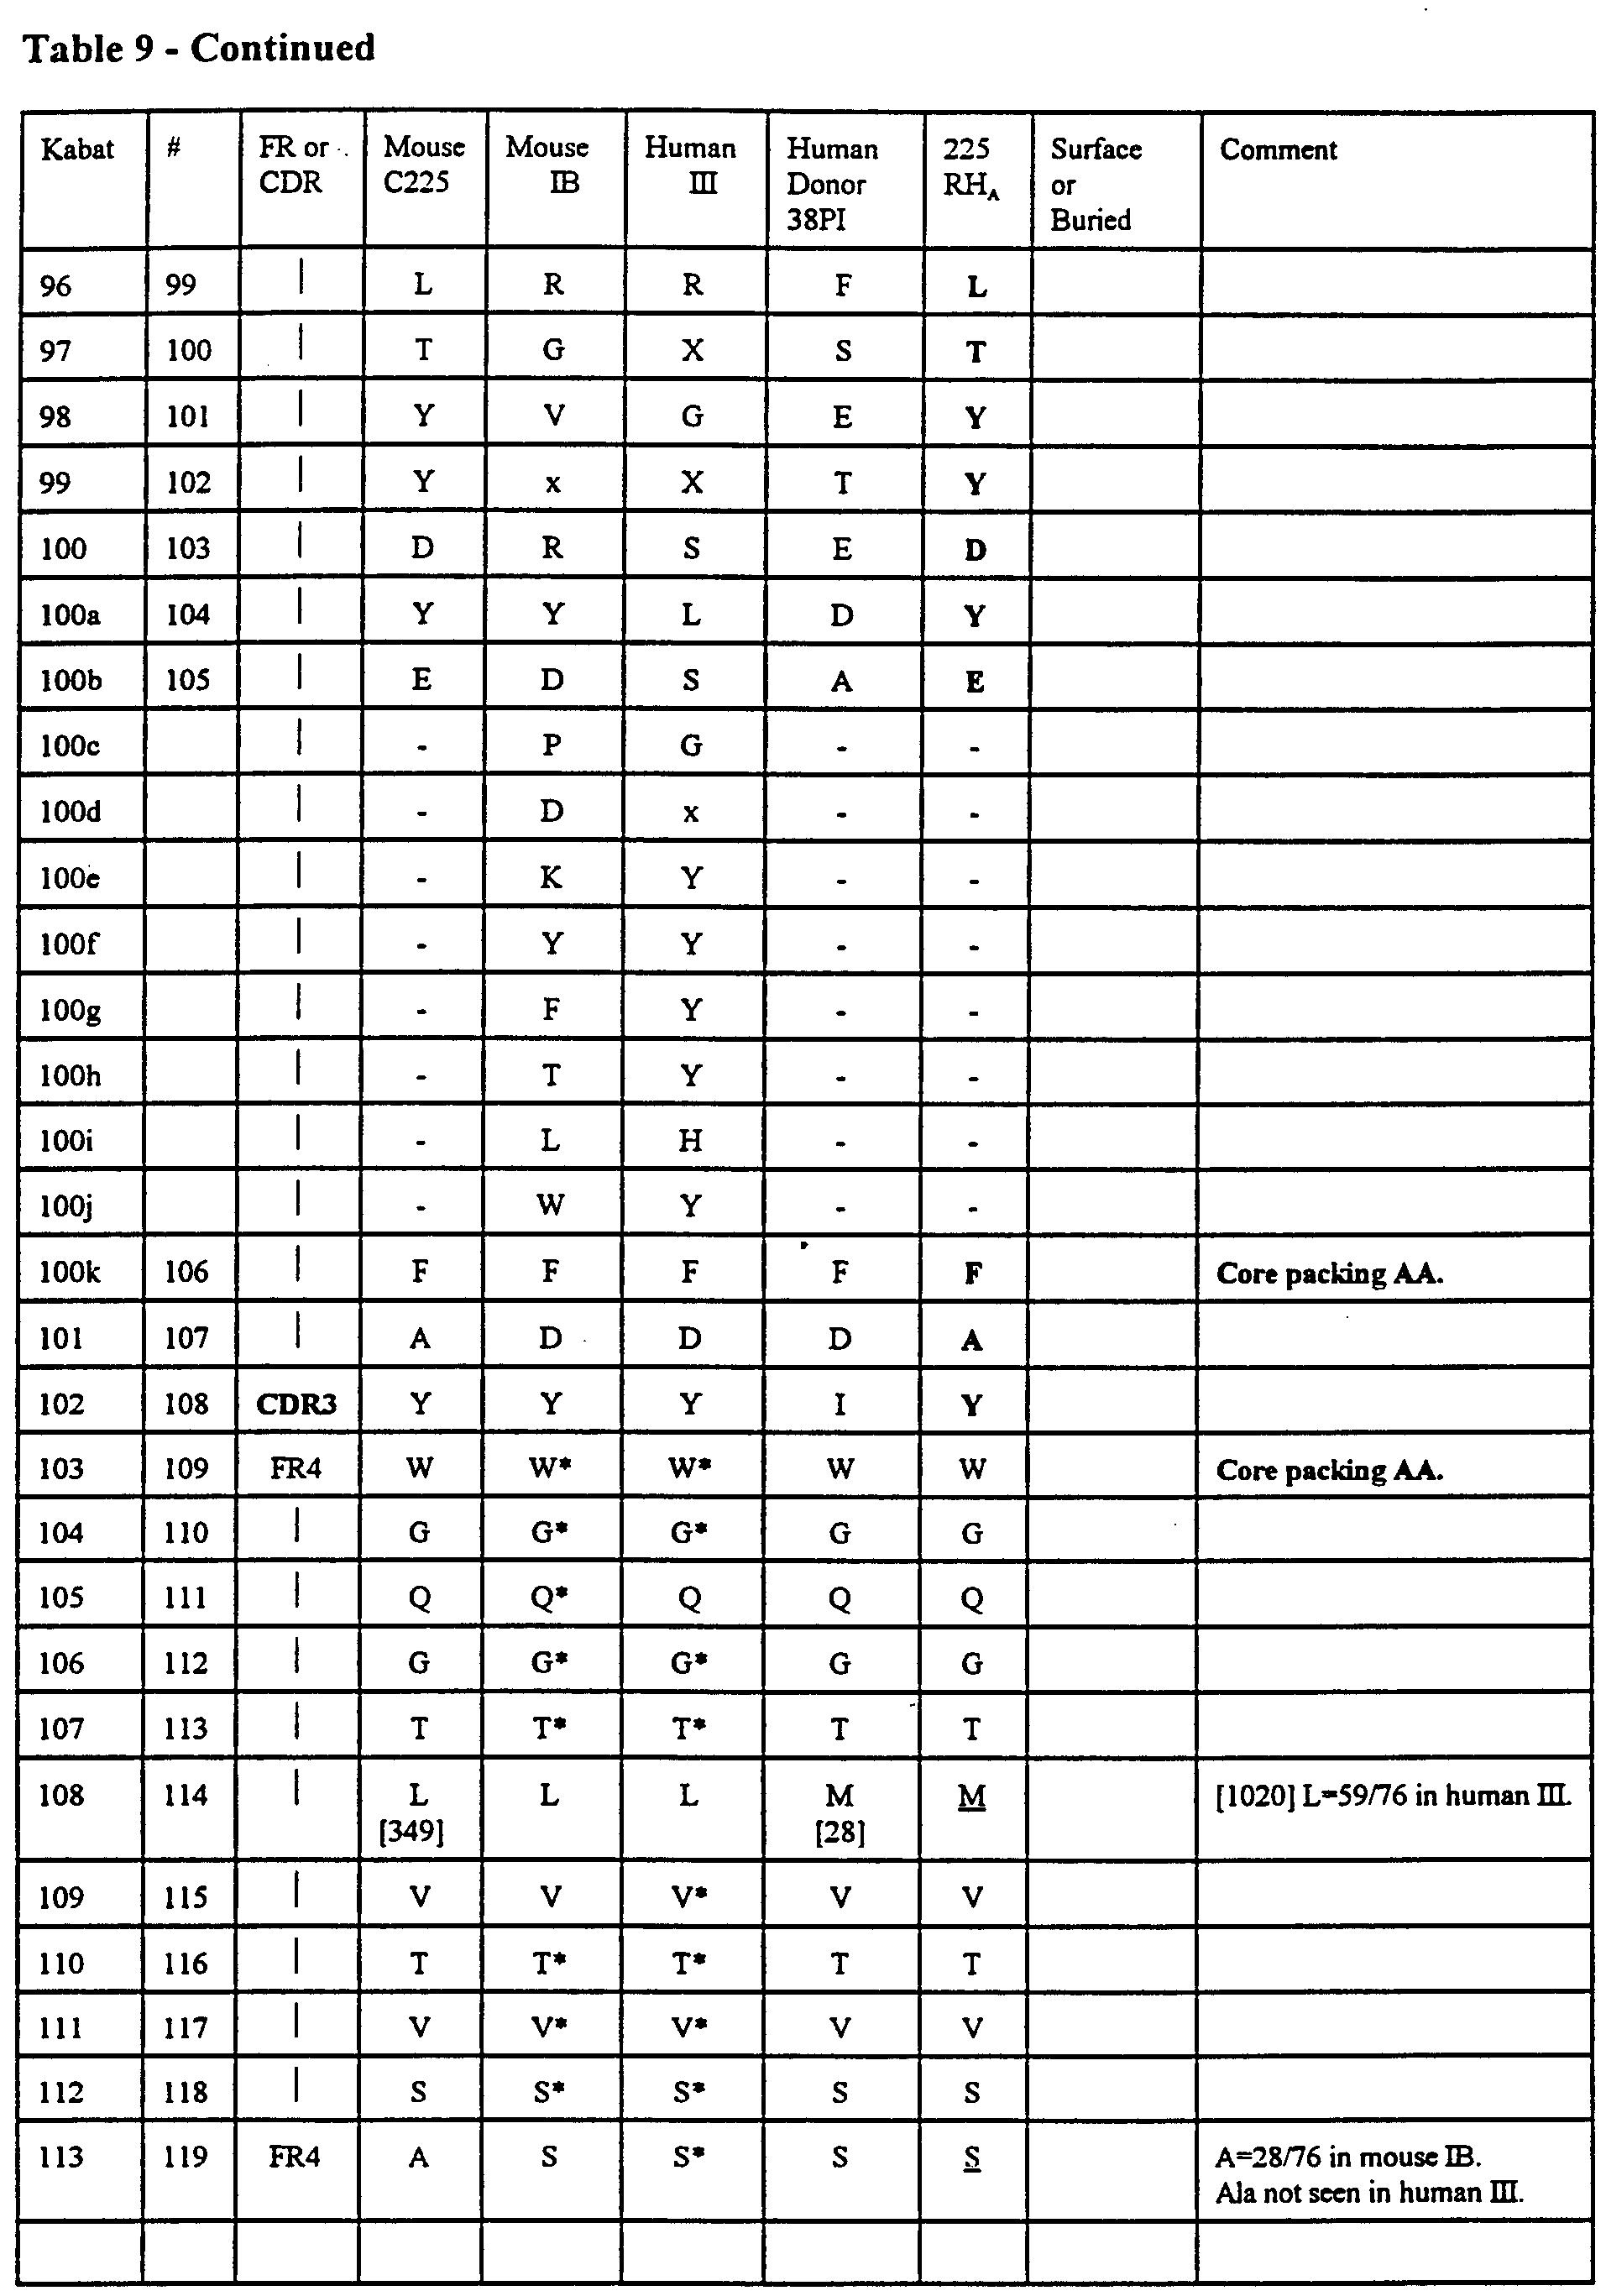 Les Legendes De La Bande Dessinee Guido Buzzelli Et Aunoa as well 1991 Mercury Capri Parts Catalog moreover 1994 Acura Integra Engine Diagram in addition EP0831880A1 also Daewoo Matiz Sohc Engine Timing Belt And Pulley Schematic Diagram. on 1992 legend l